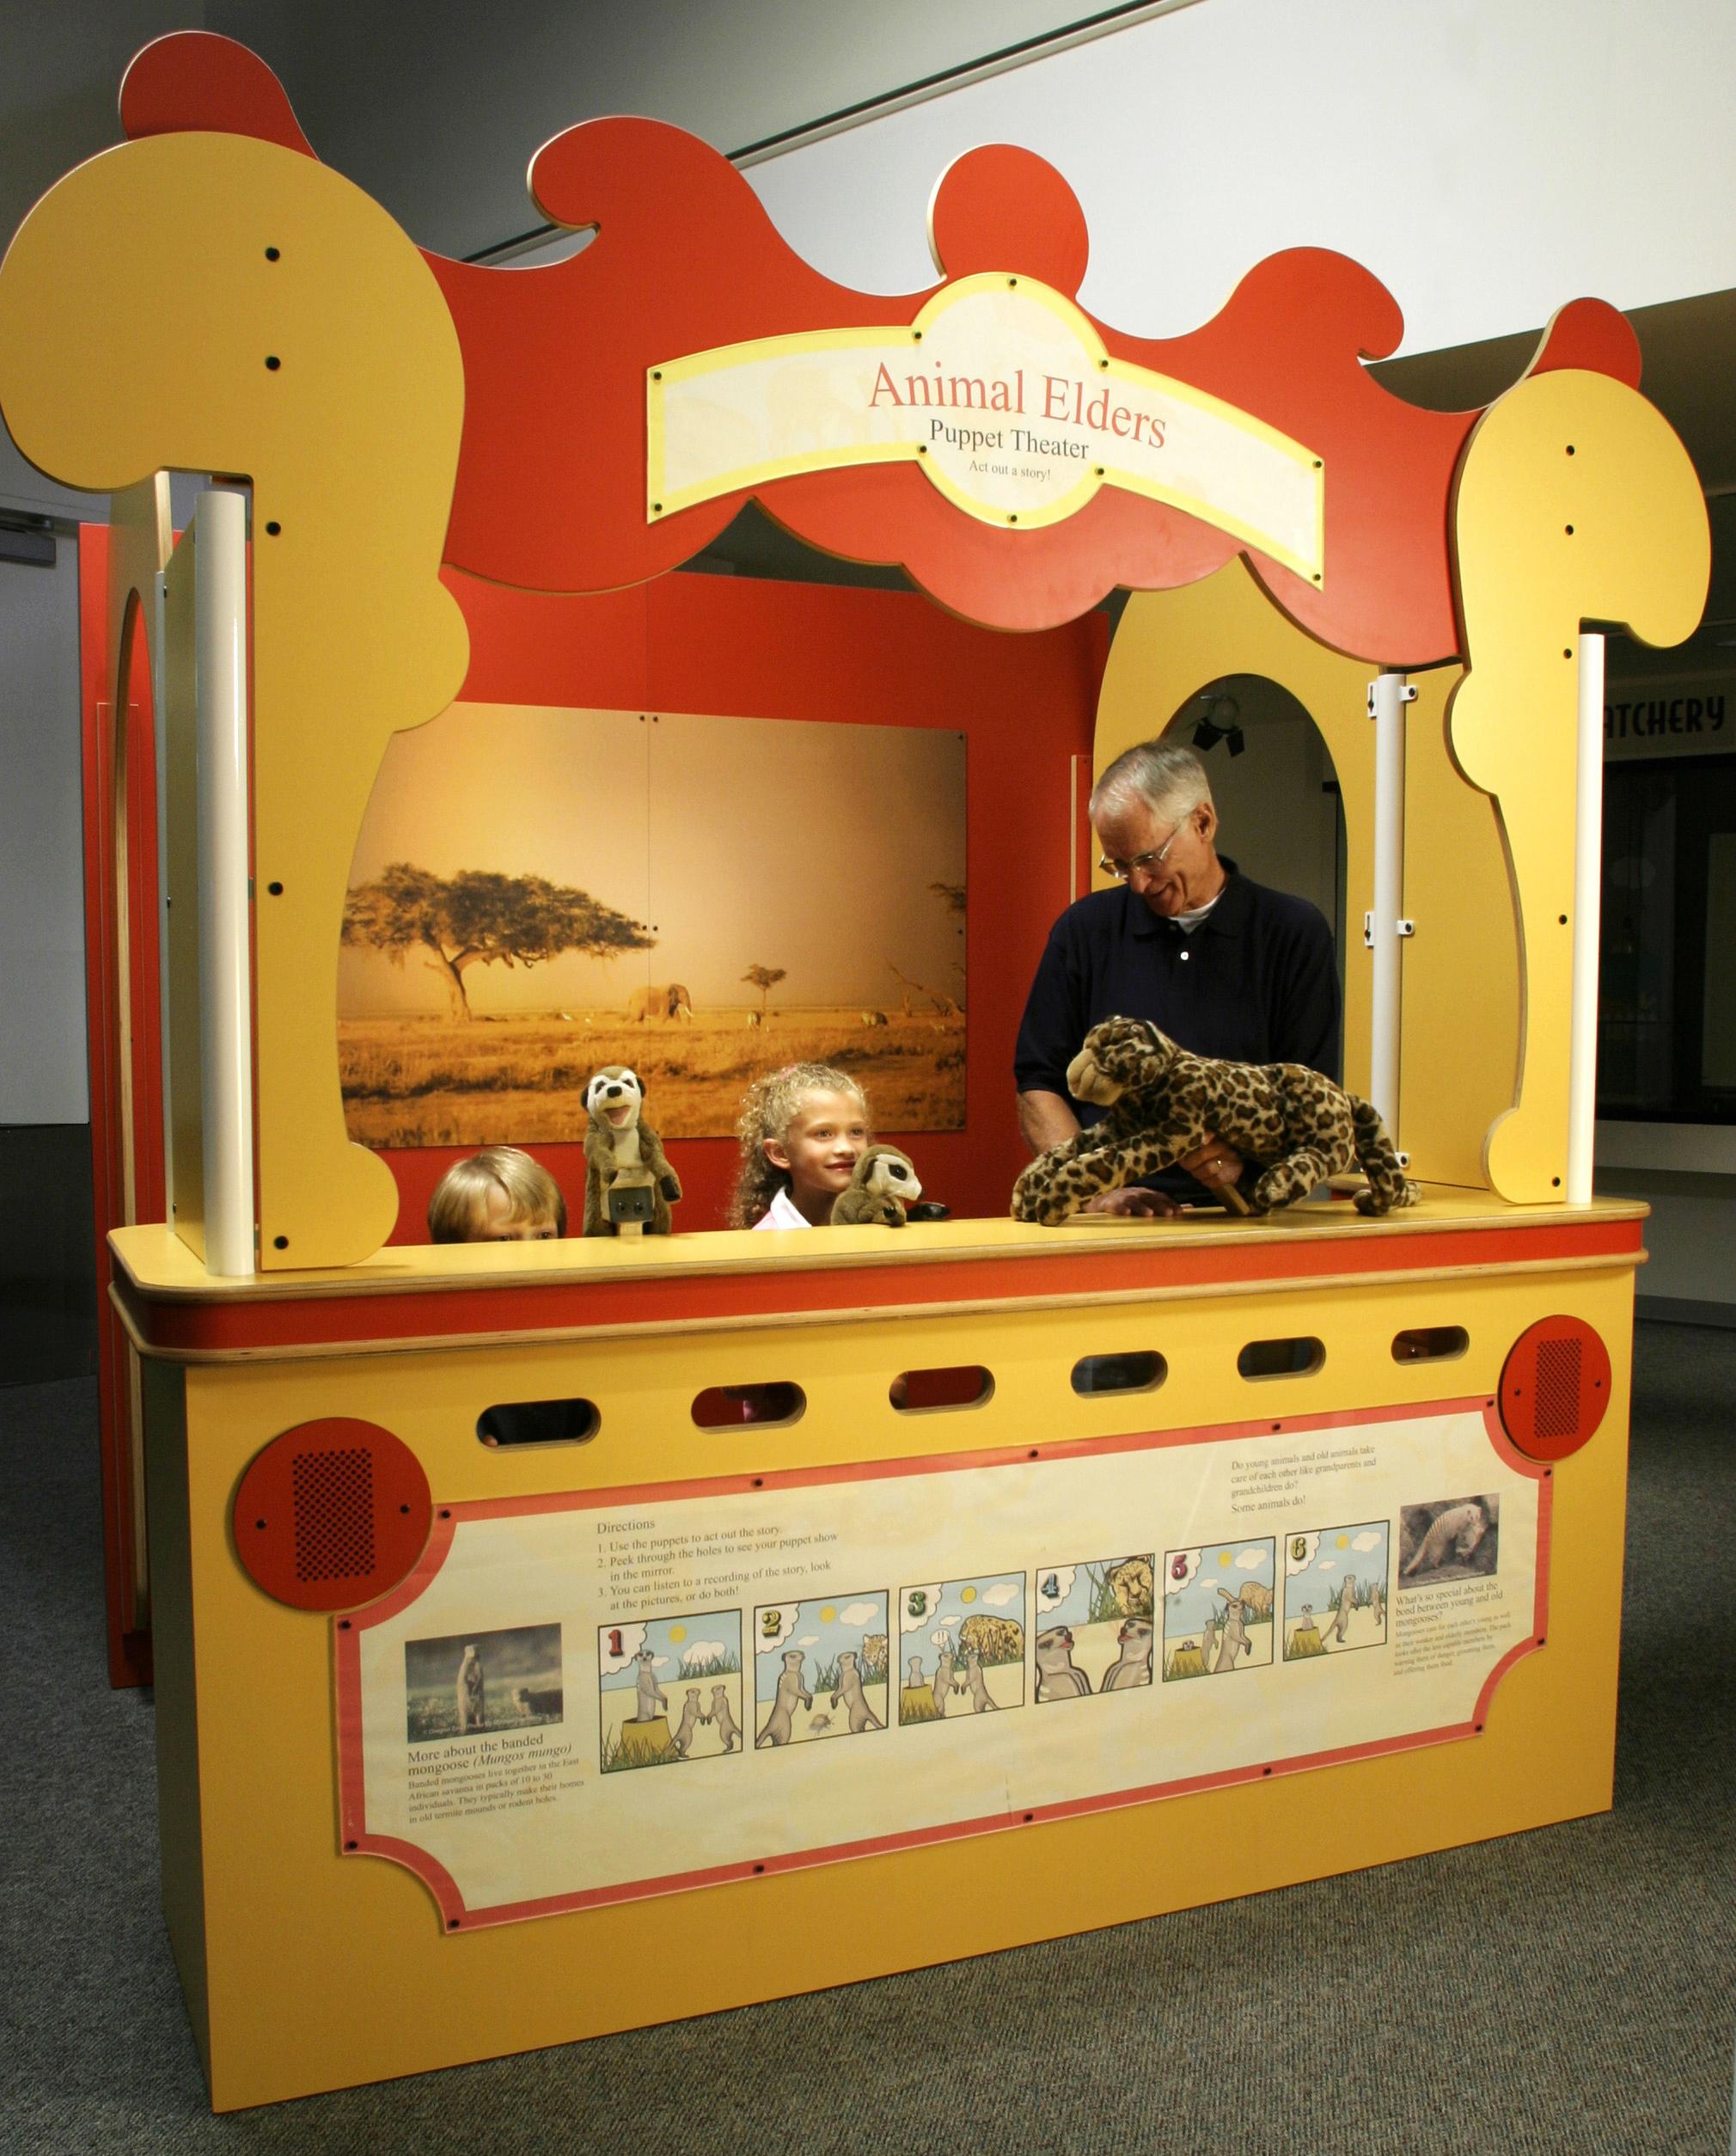 Puppet Theater on Human Foosball Diagram